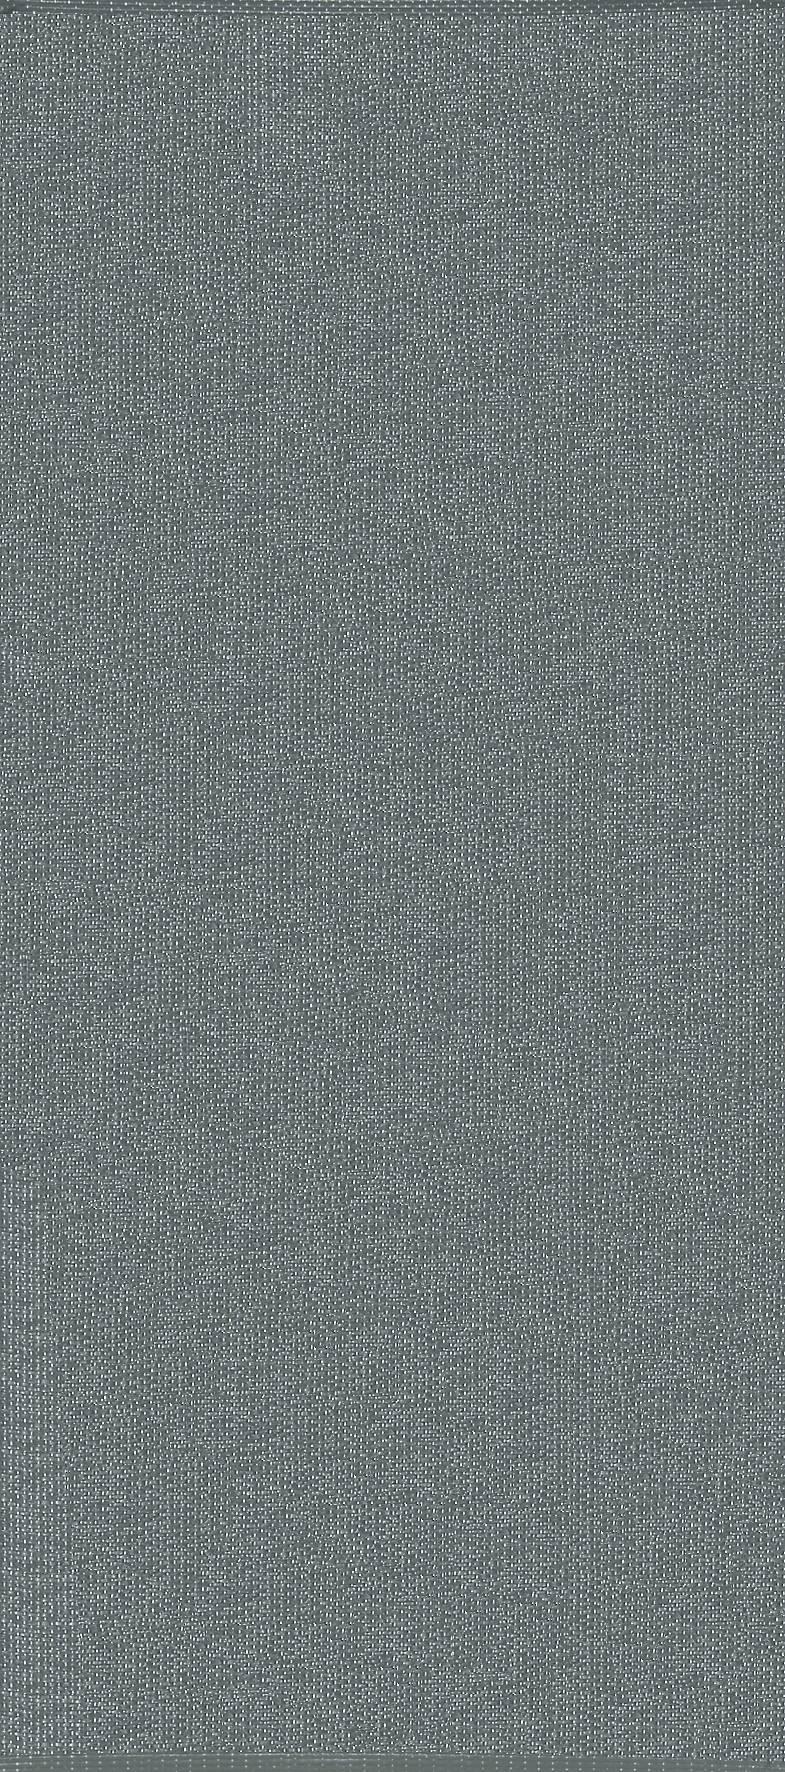 Plasttæppe Plain 70 x 200 cm Horredsmattan Plasttæpper til Boligen i Grafitgrå